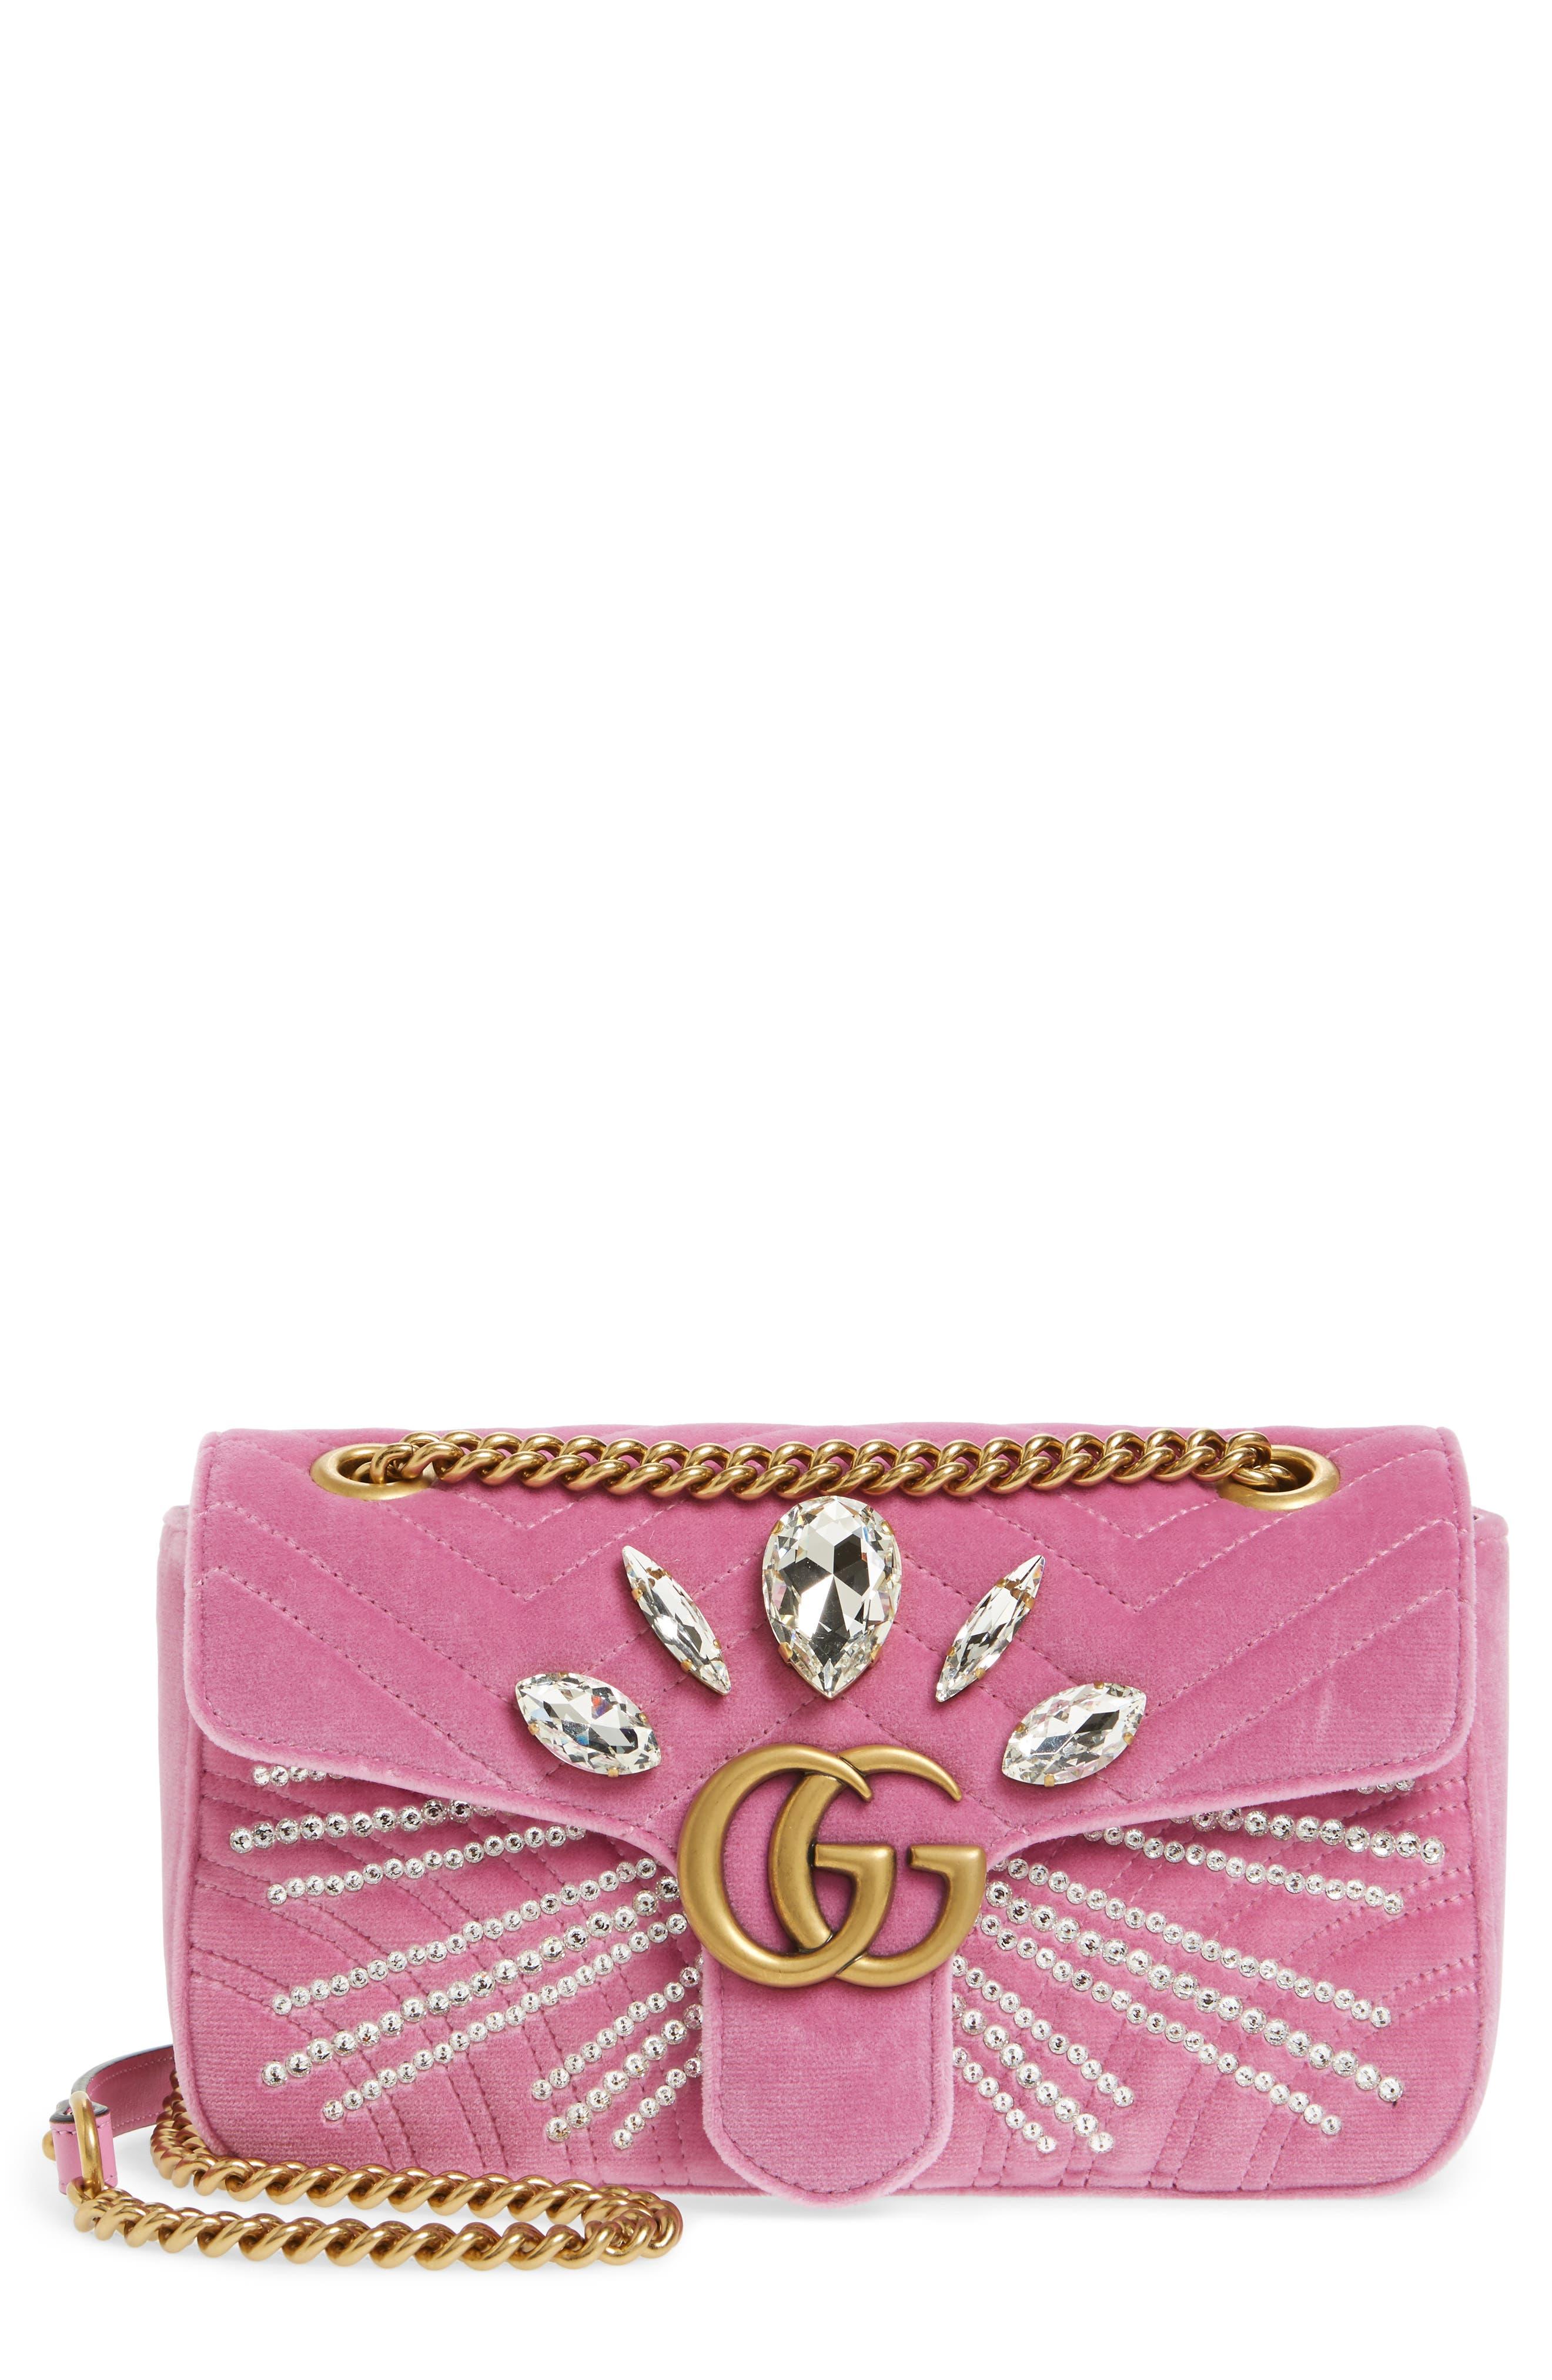 Main Image - Gucci GG Marmont 2.0 Crystal Embellished Velvet Crossbody Bag